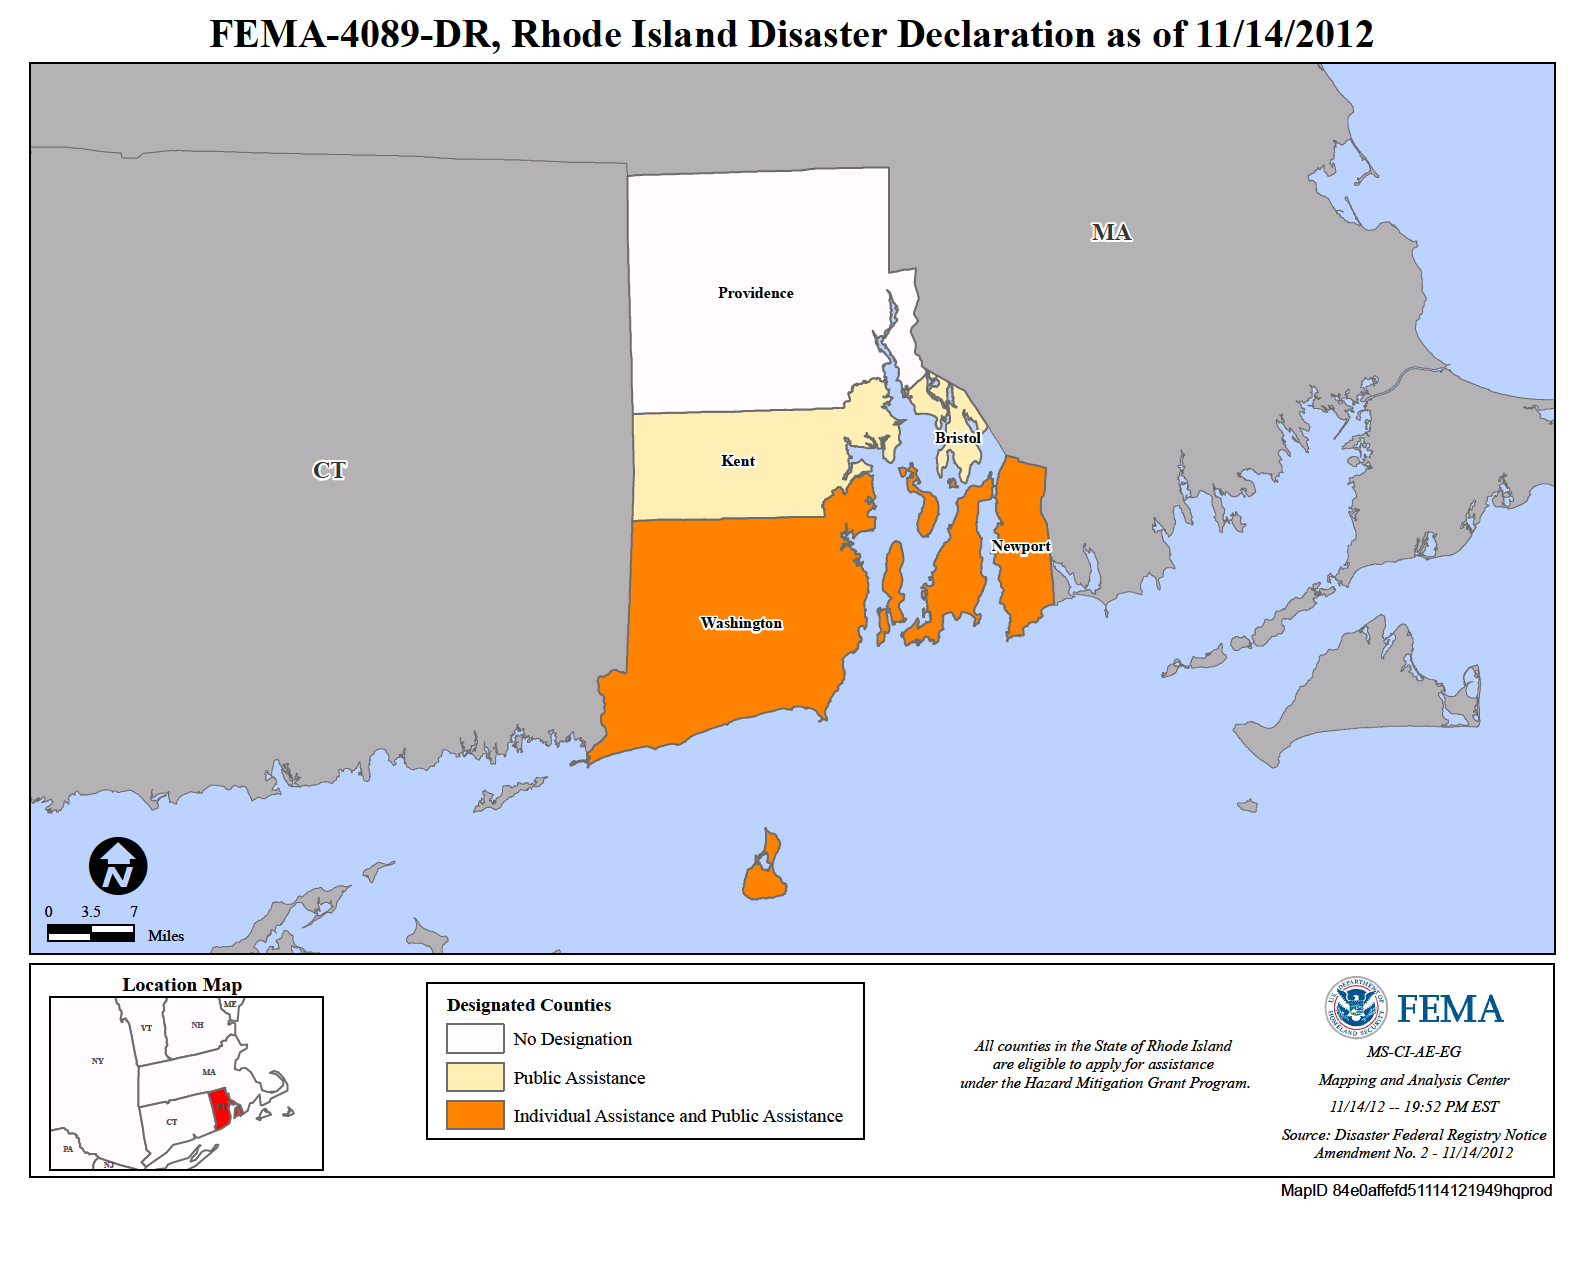 rhode island flood maps Rhode Island Hurricane Sandy Dr 4089 Fema Gov rhode island flood maps